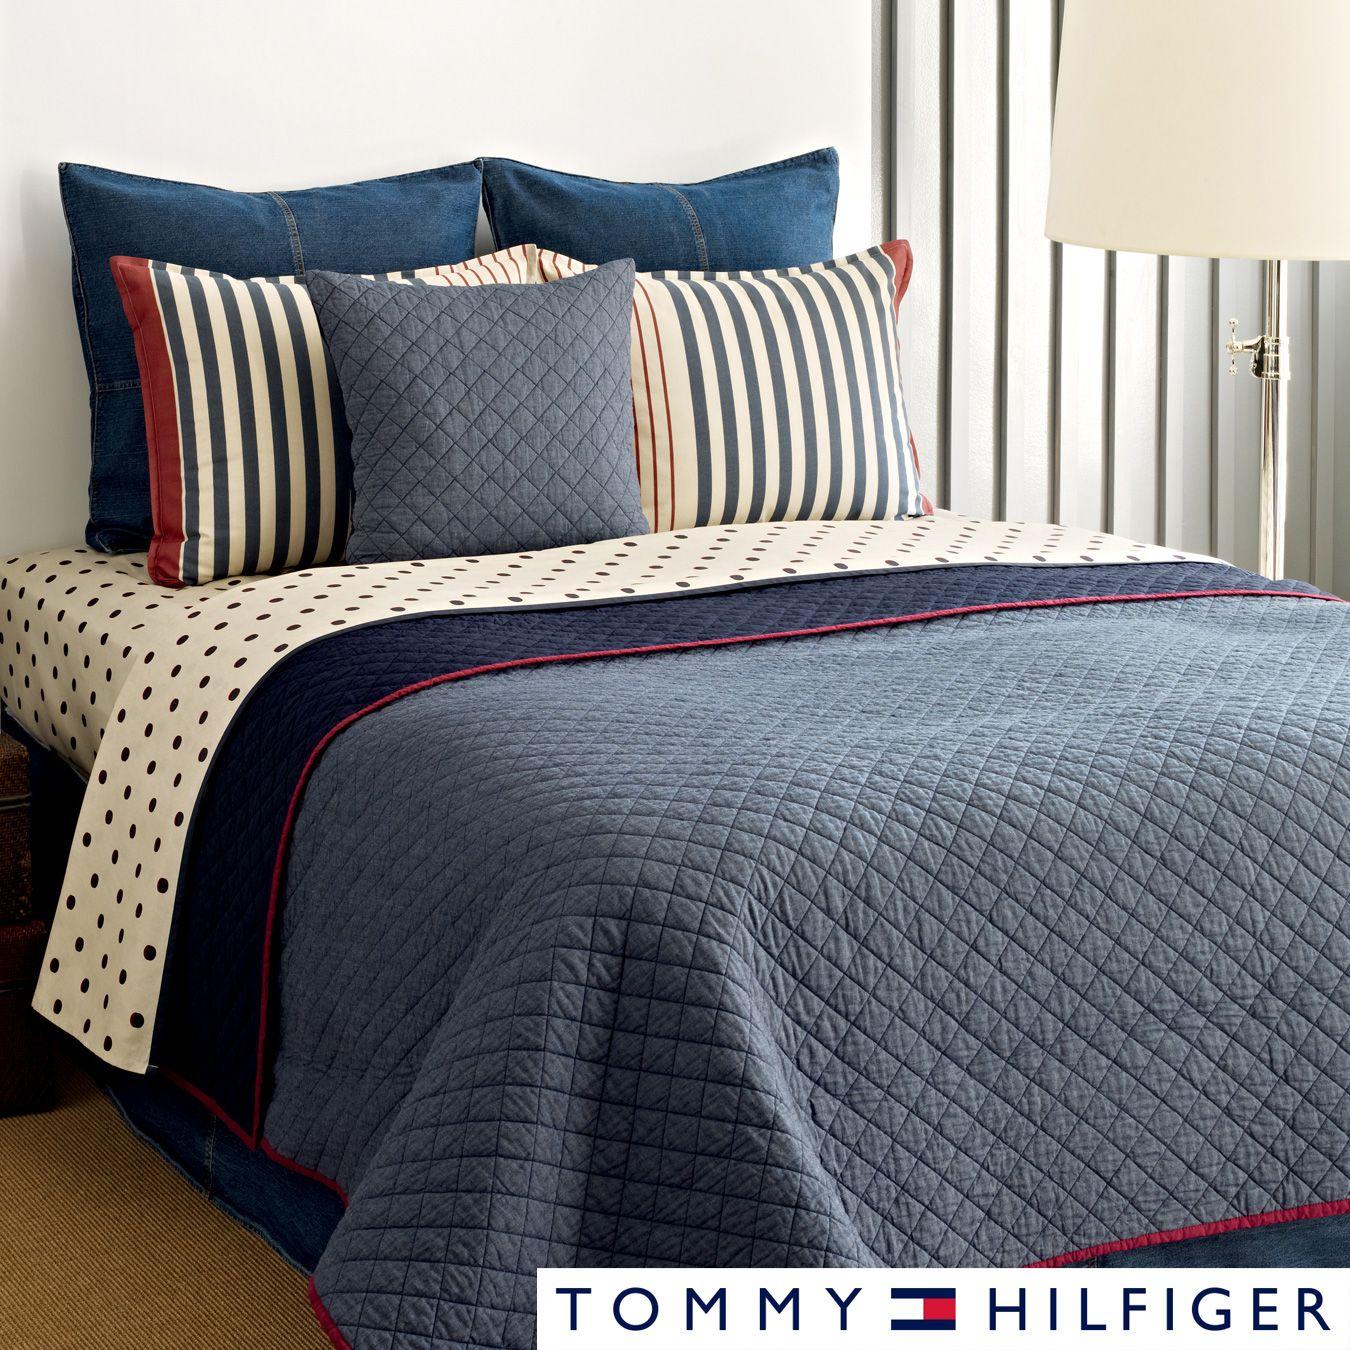 Tommy Hilfiger Quilt Sets Include 2 Shams Plus Quilt 1